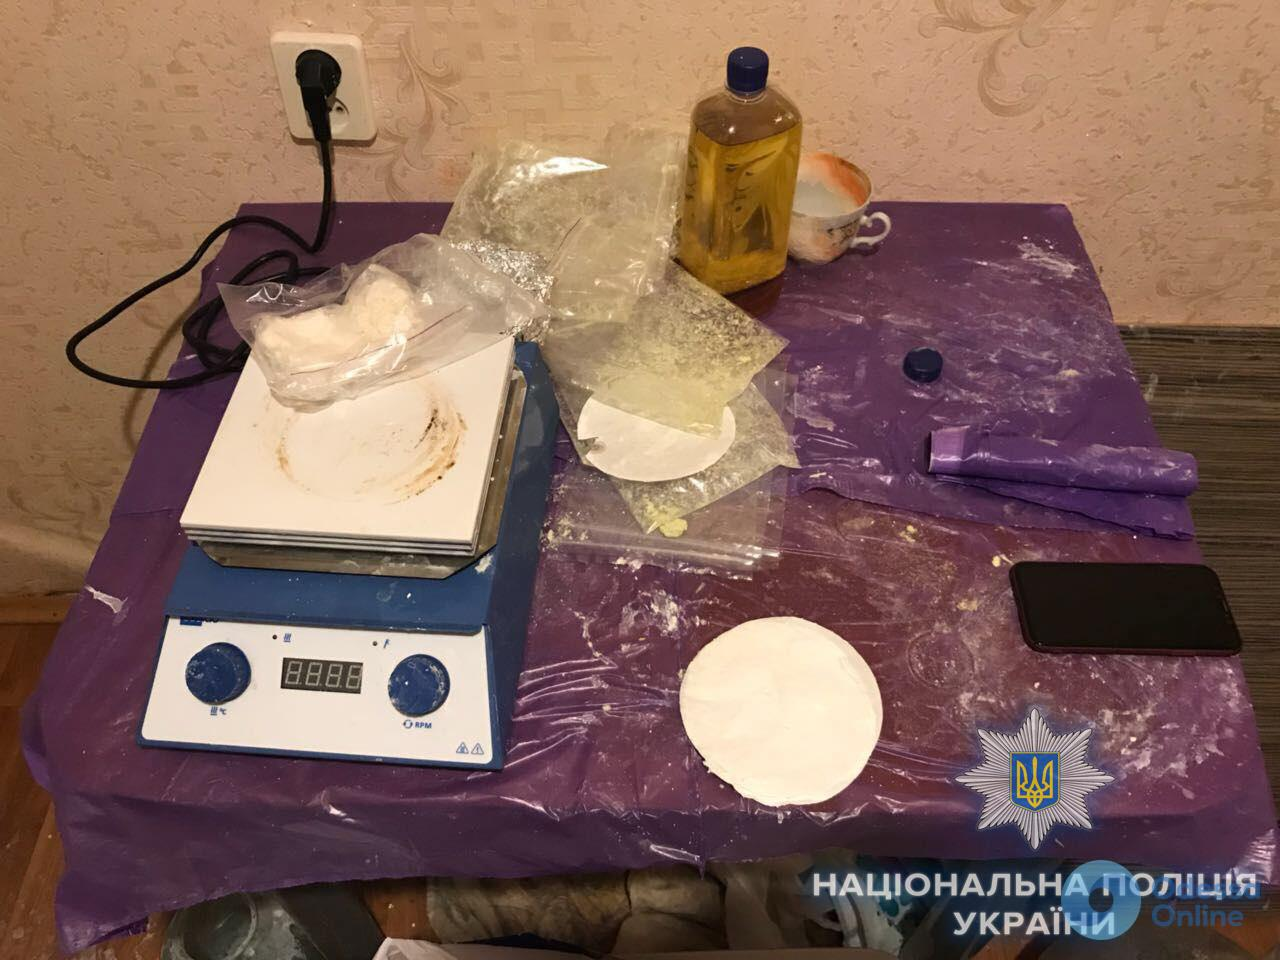 Полицейские разоблачили нарколабораторию молодого одессита (фото)